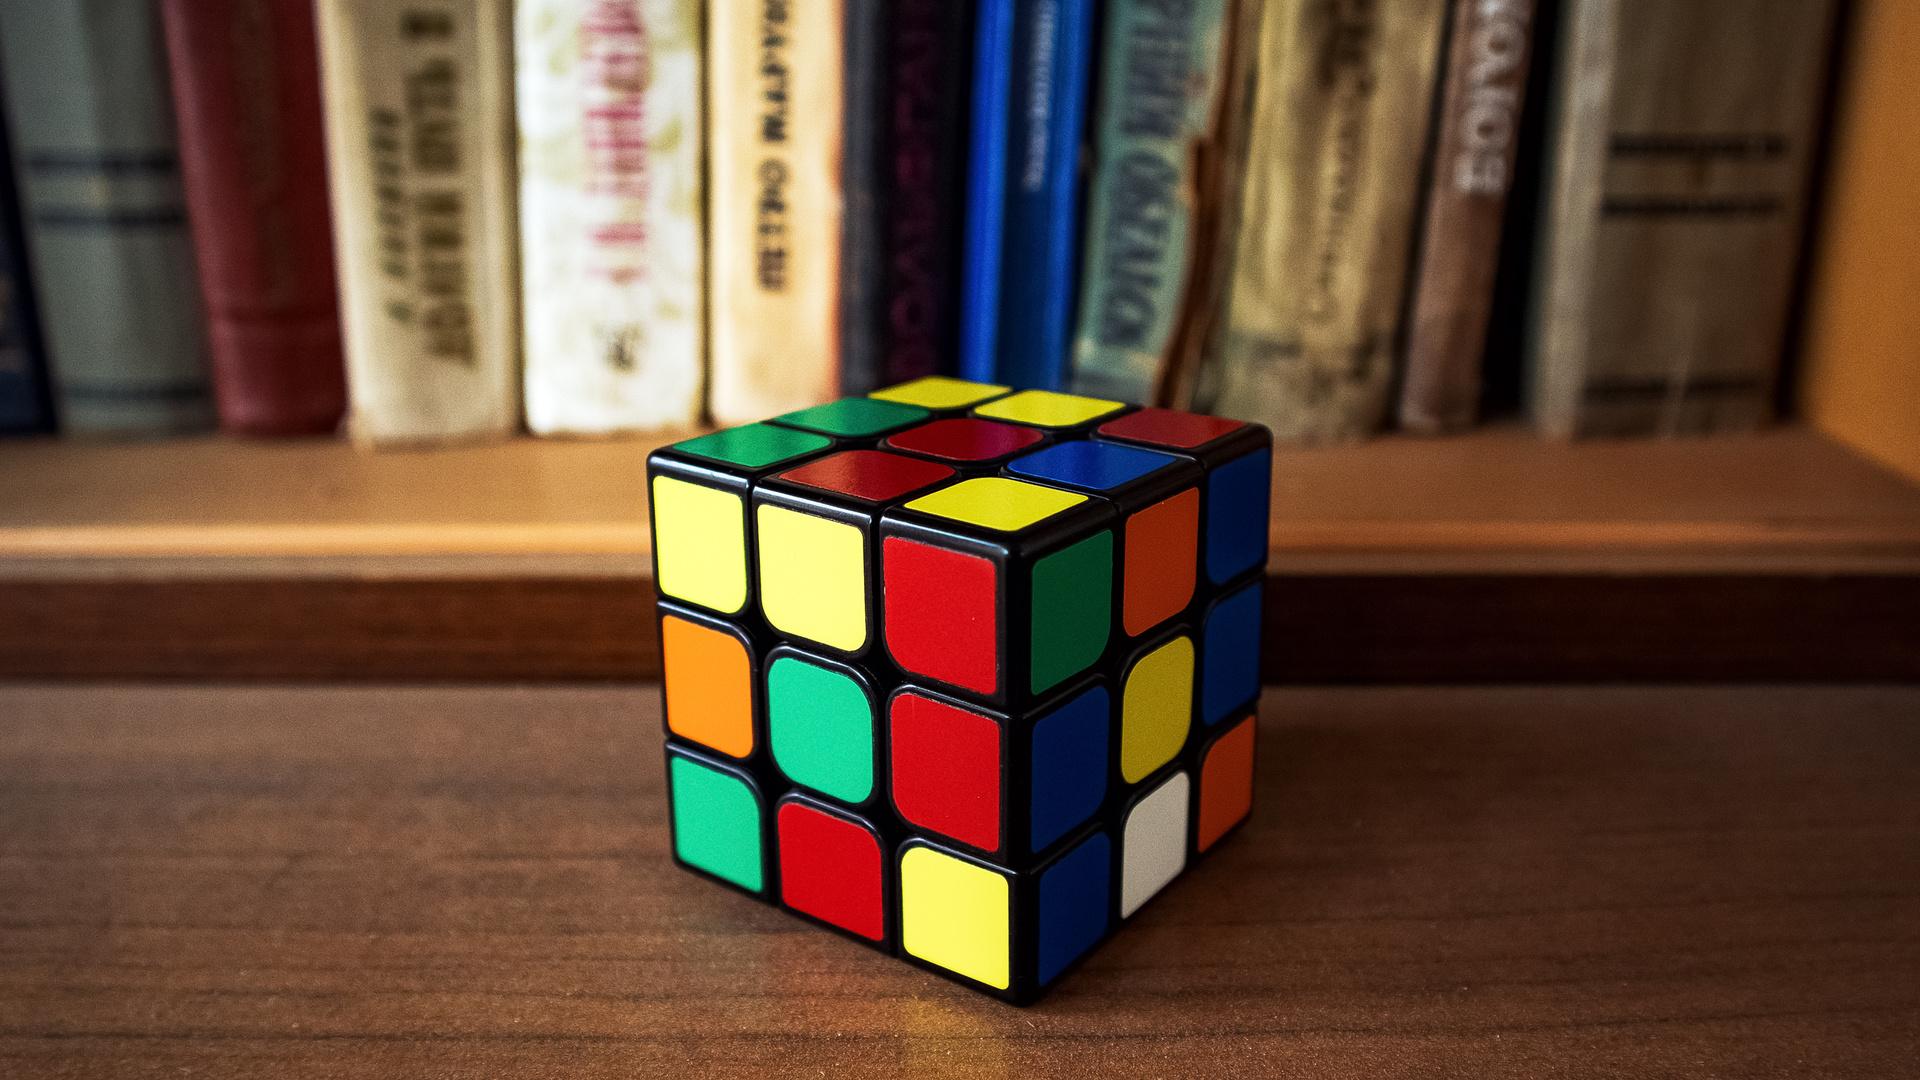 куб, книги